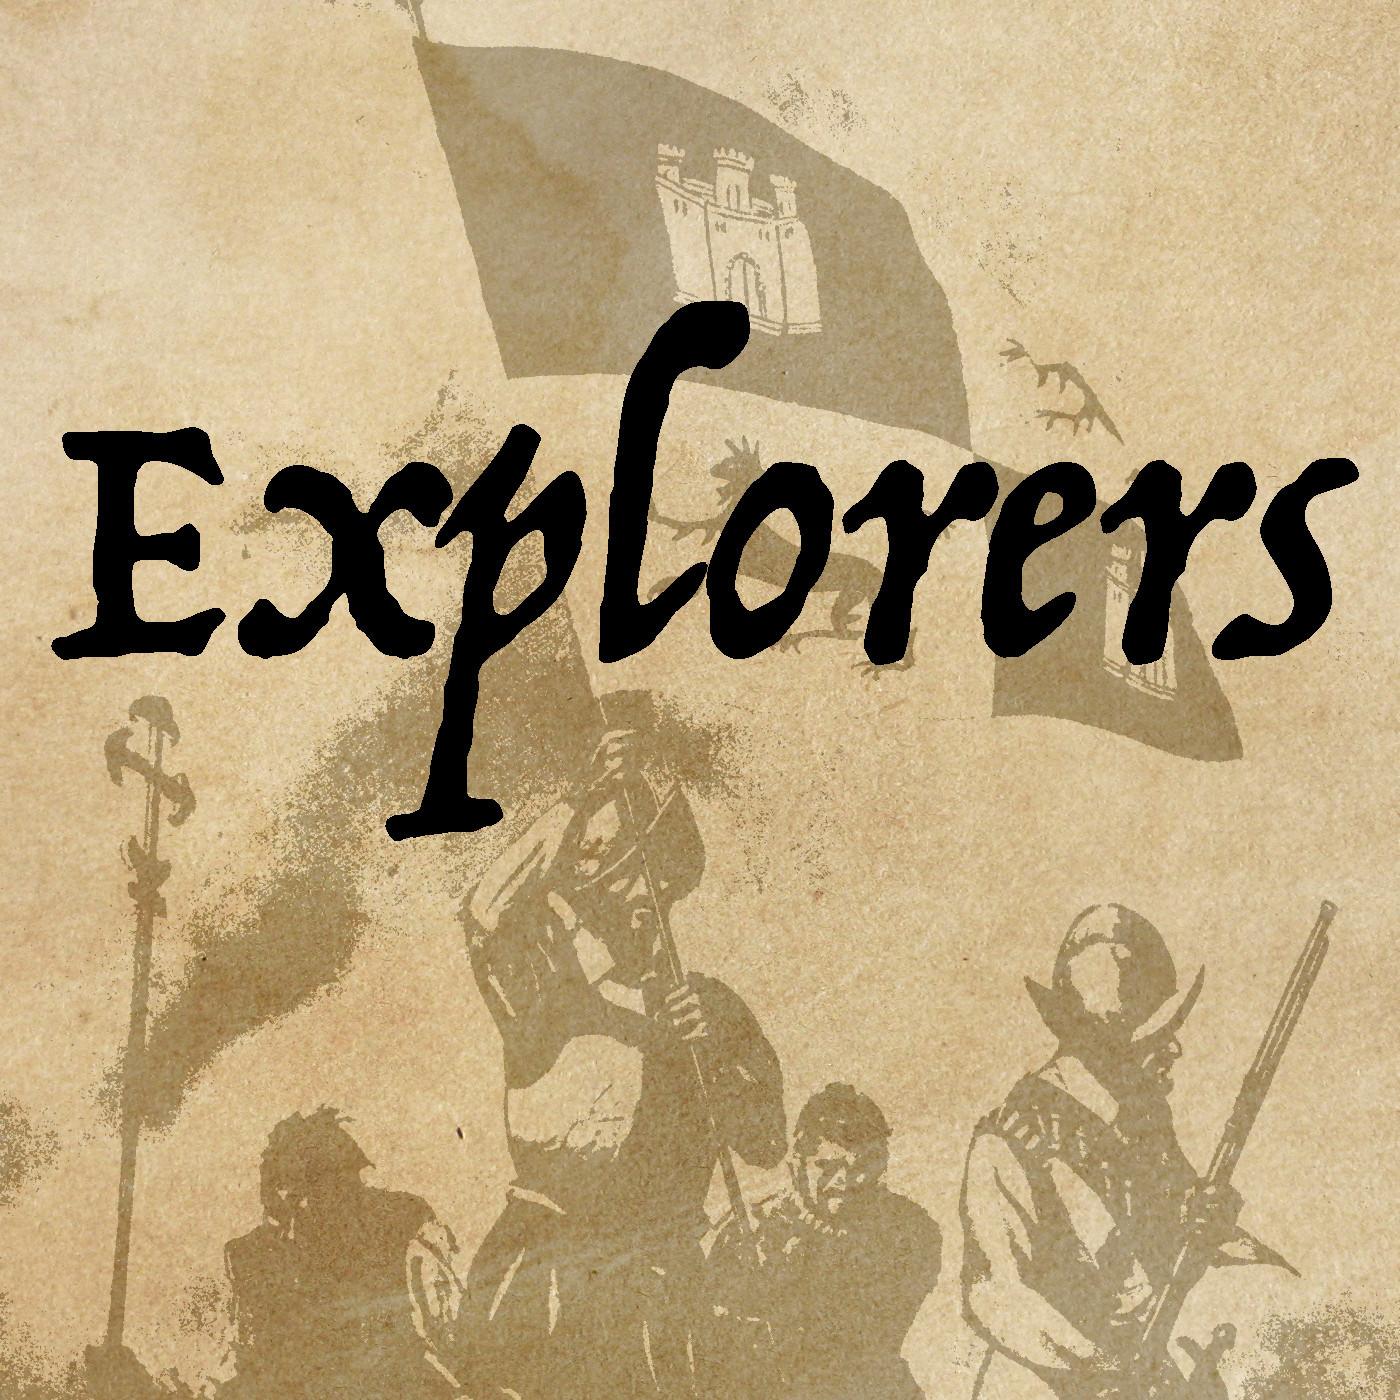 Christopher Columbus - Part 4